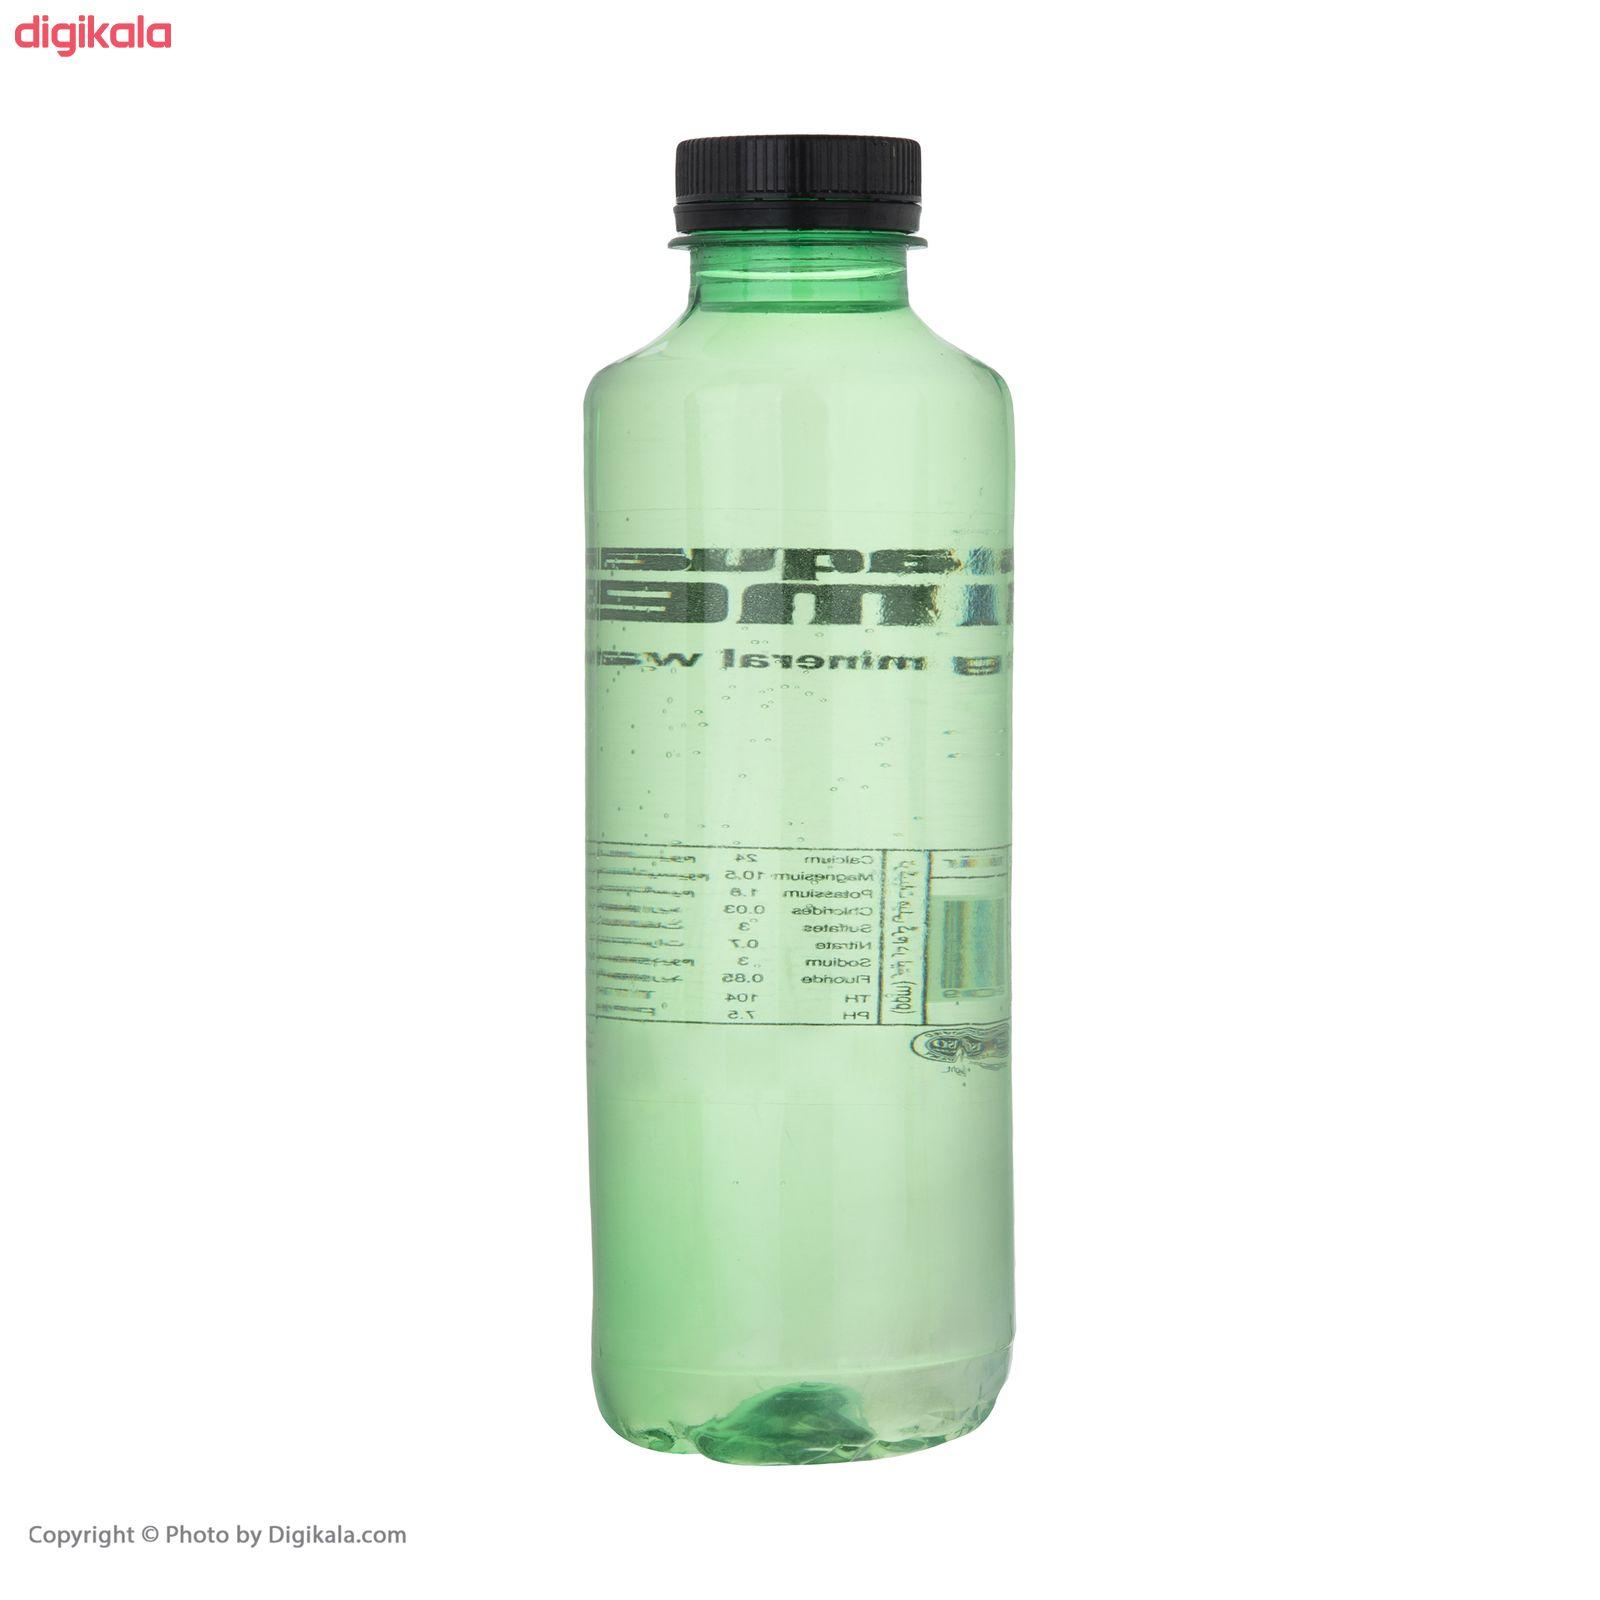 آب معدنی آکوا پرایم ویژه -300 میلی لیتر بسته 12 عددی main 1 1